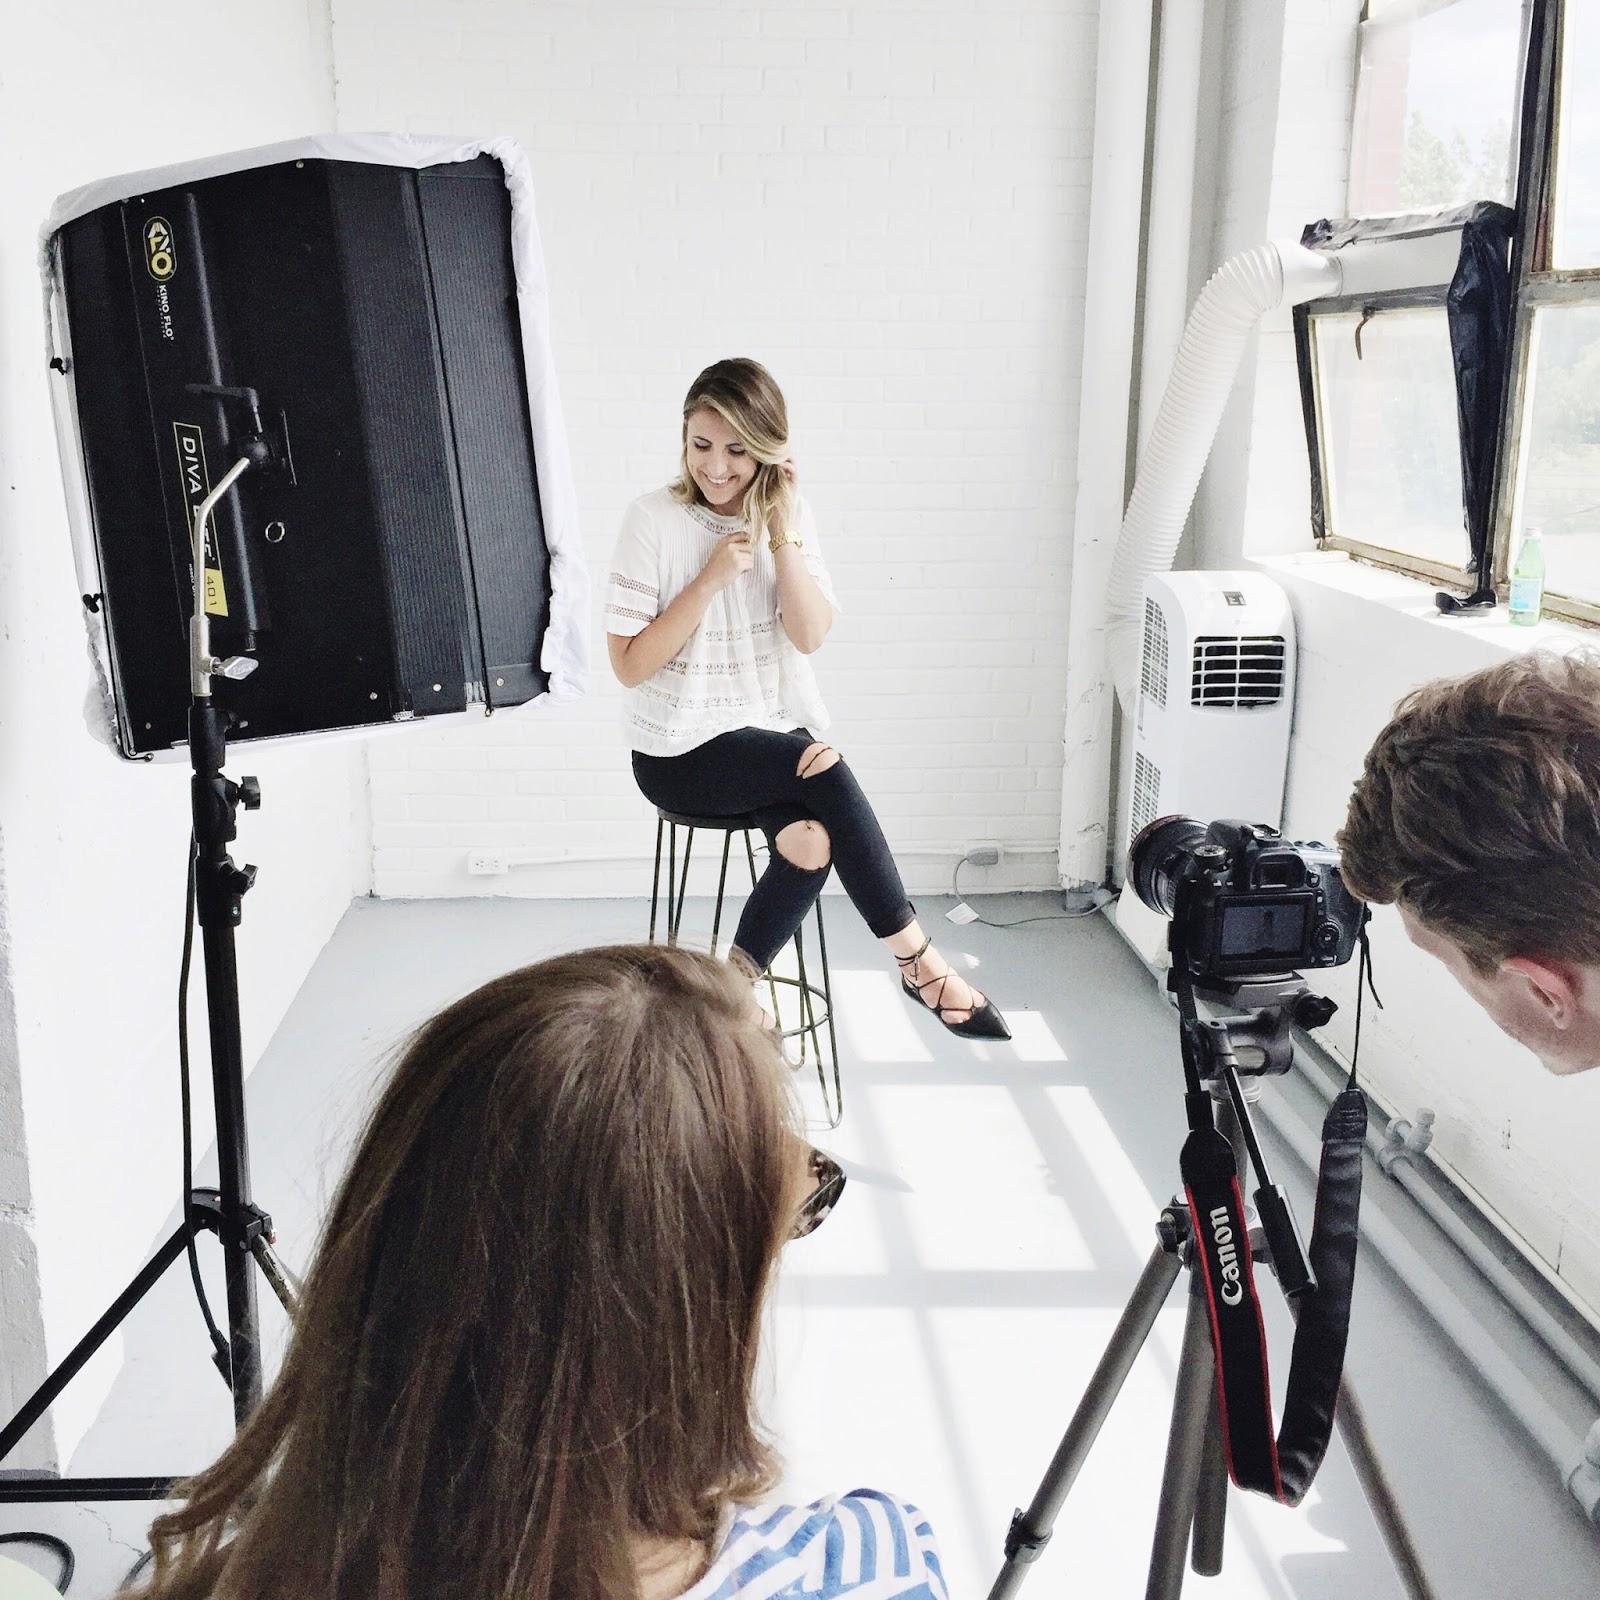 Behind the scenes shot #2